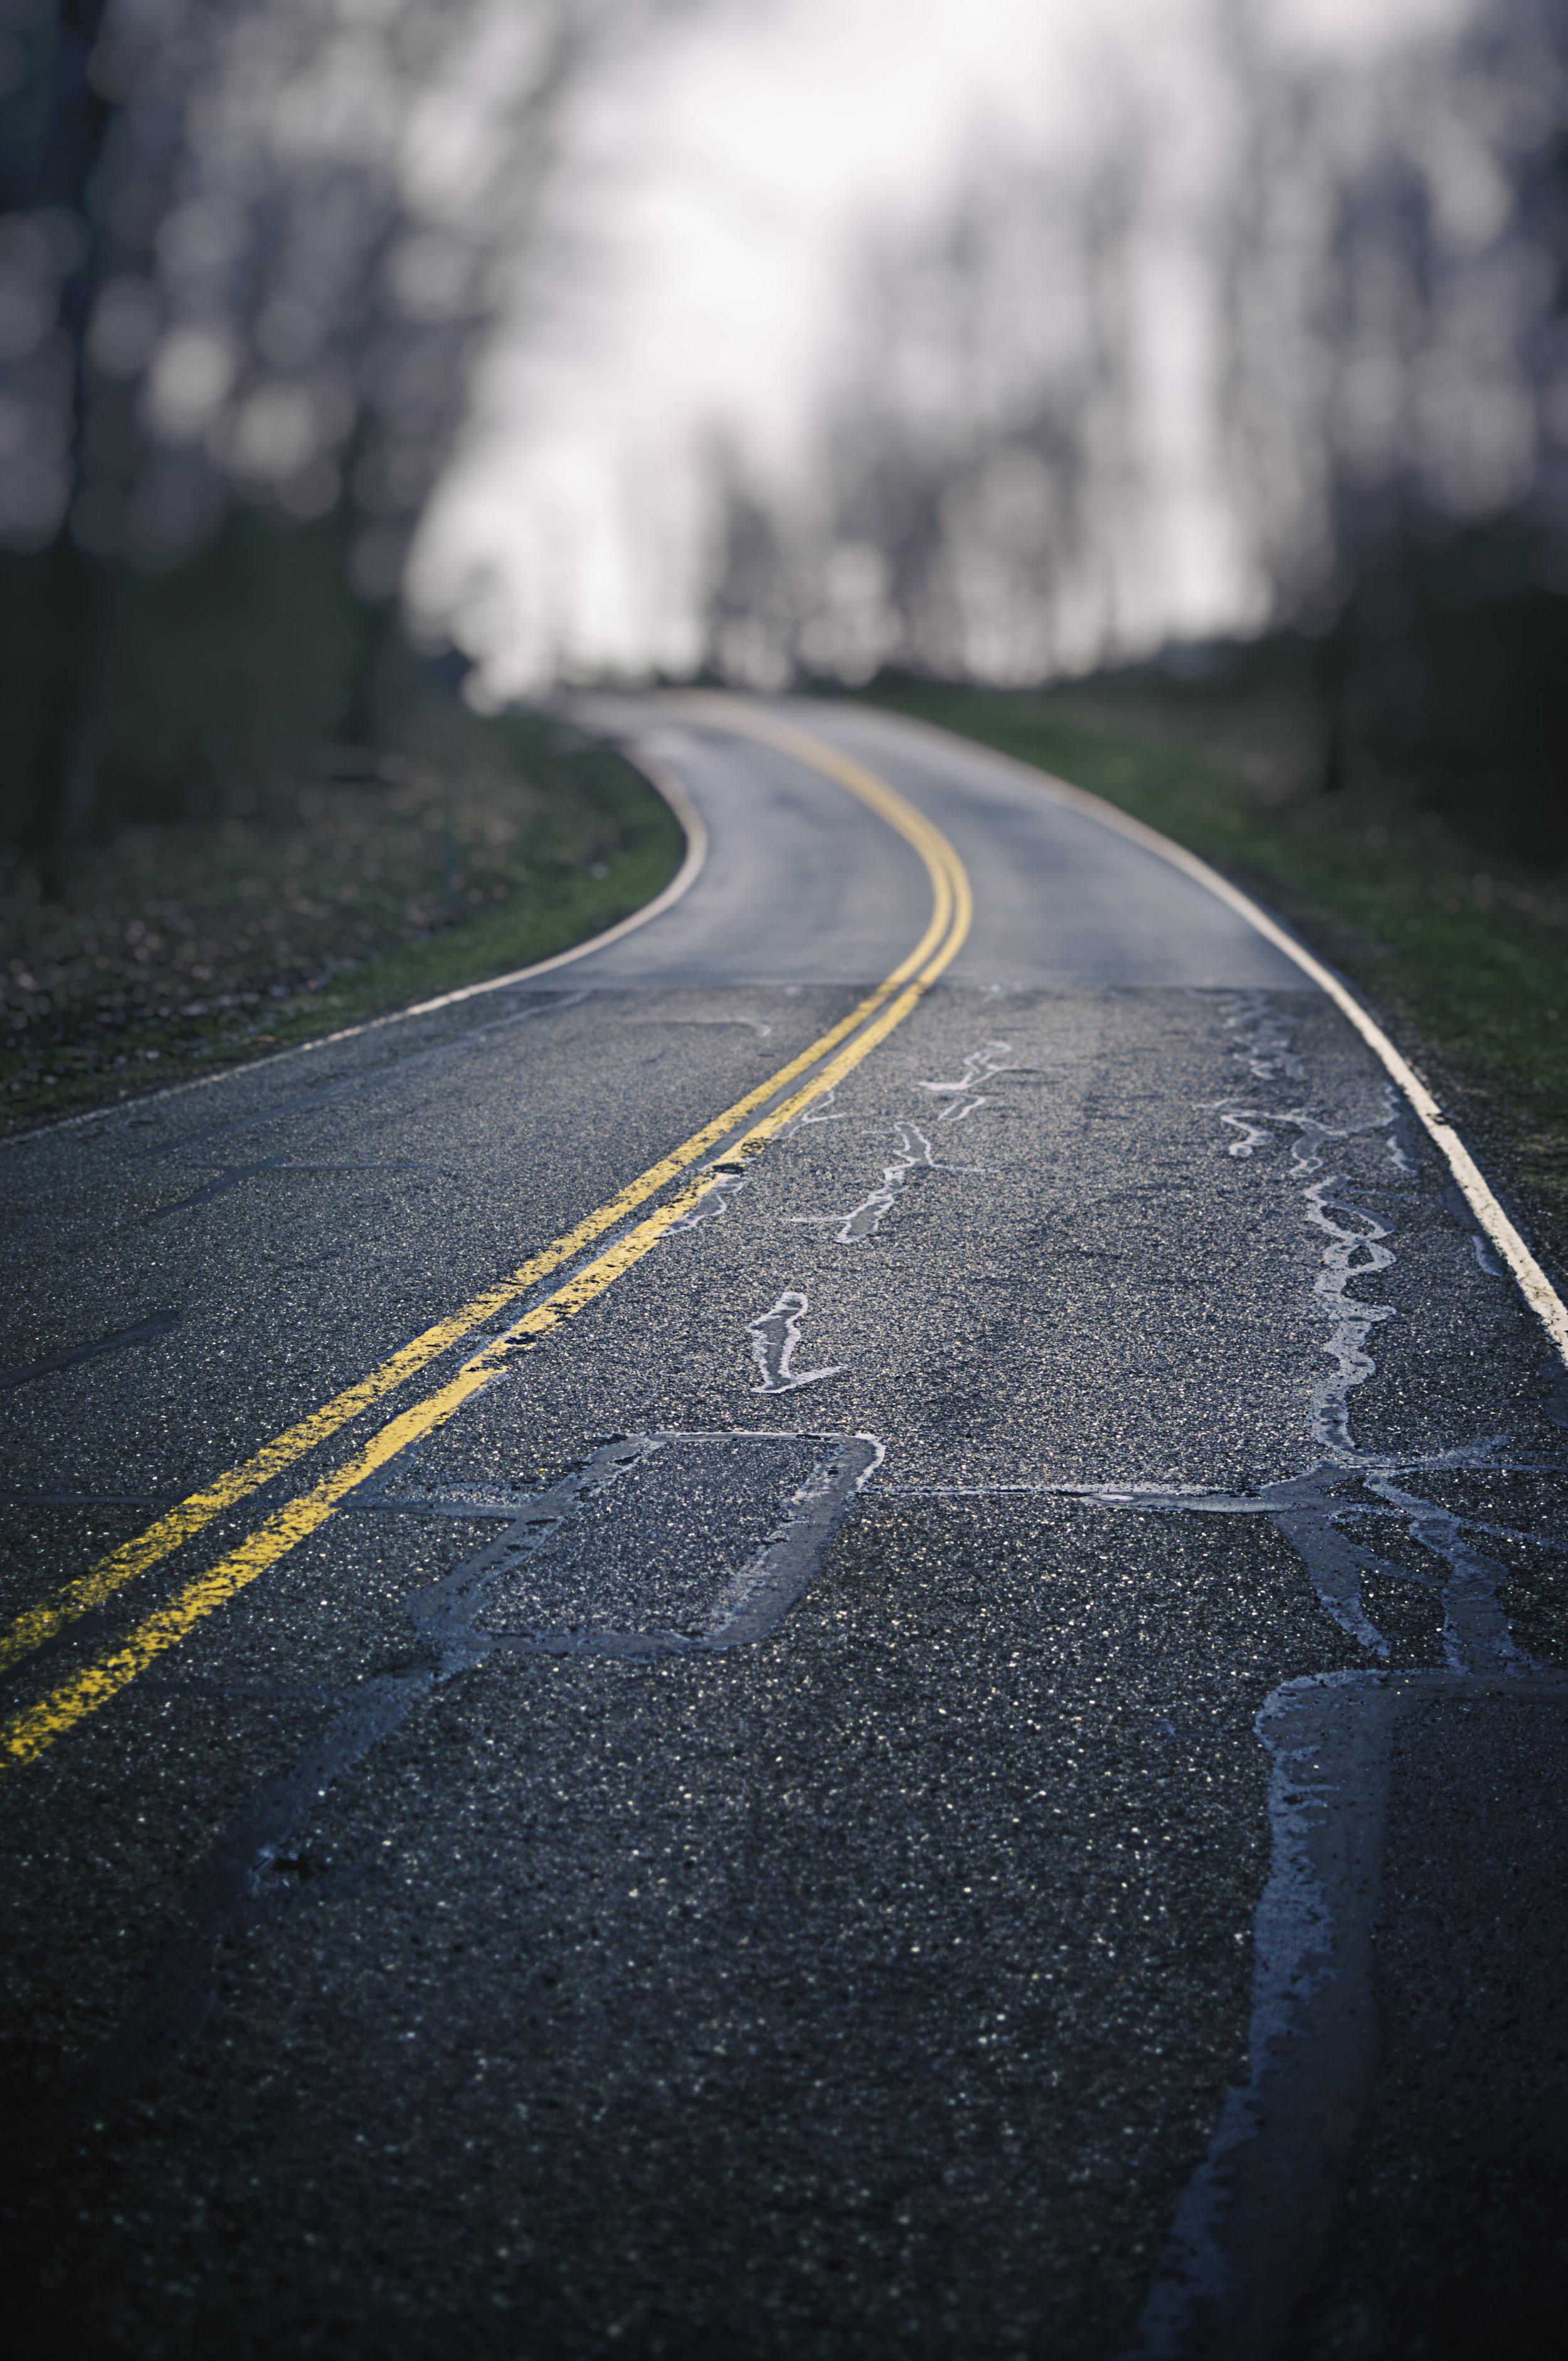 Urban_road_002.jpg